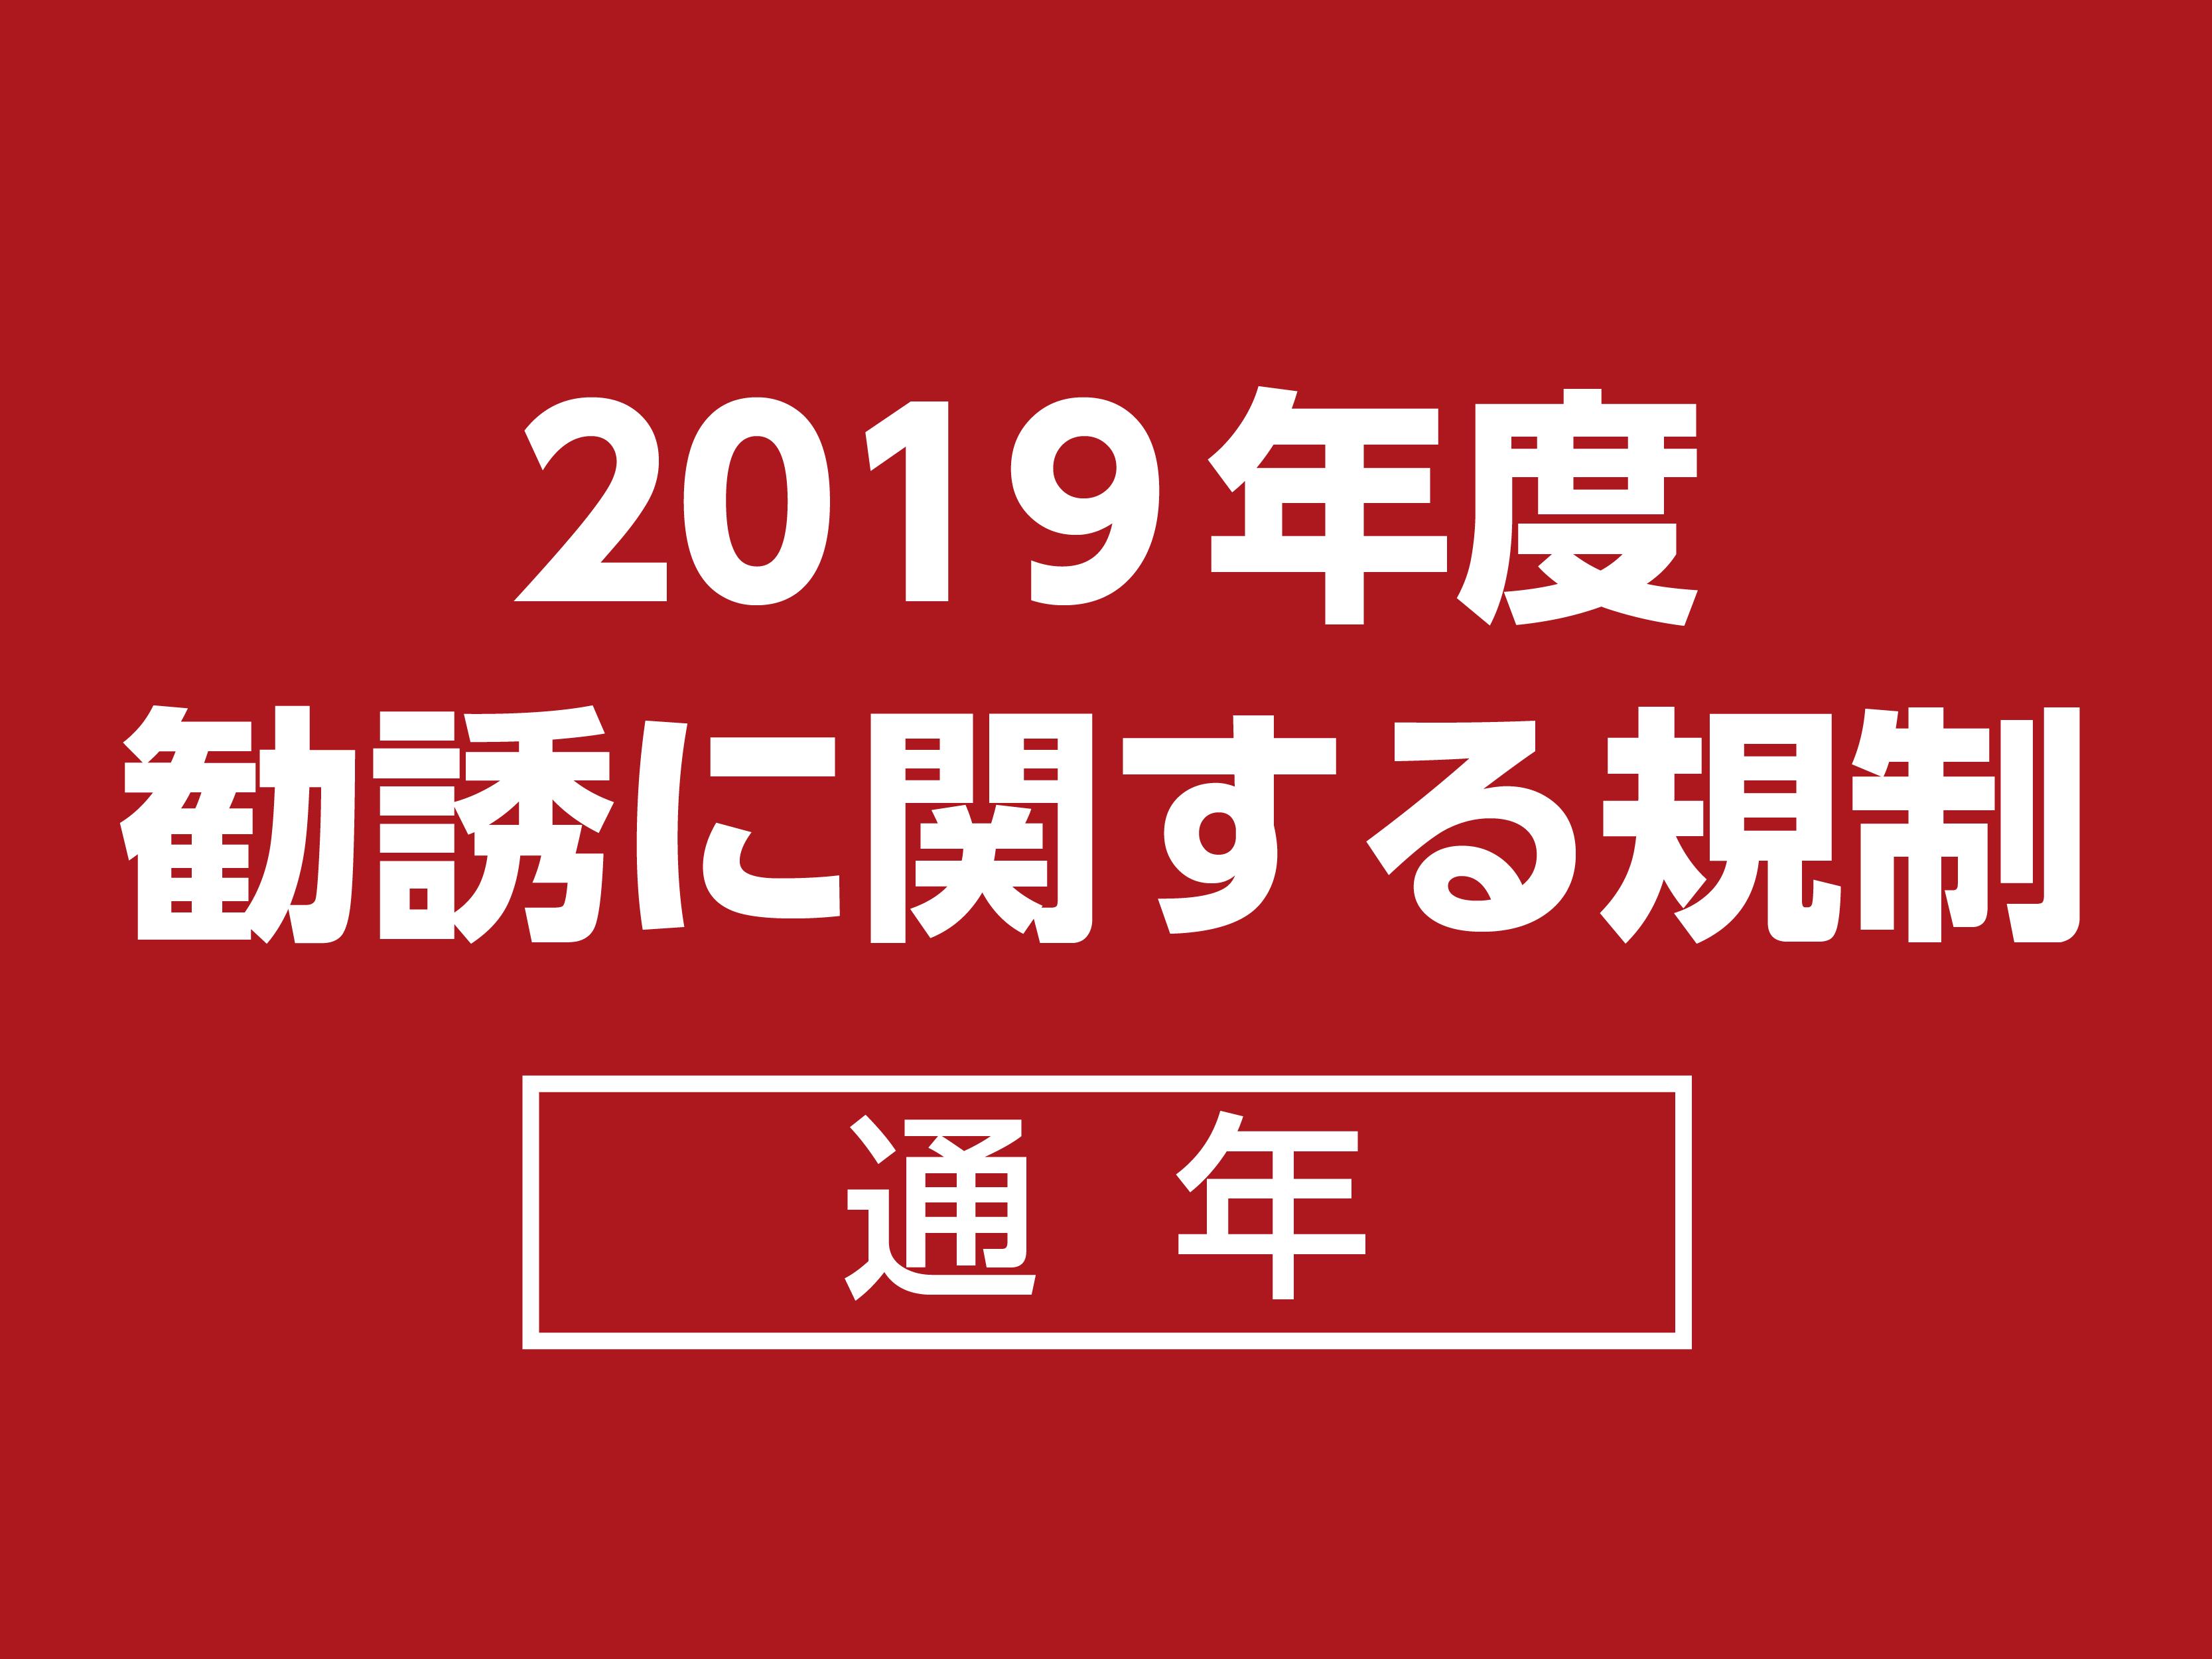 迷惑 トラスト 電話 会社 株式 新 成